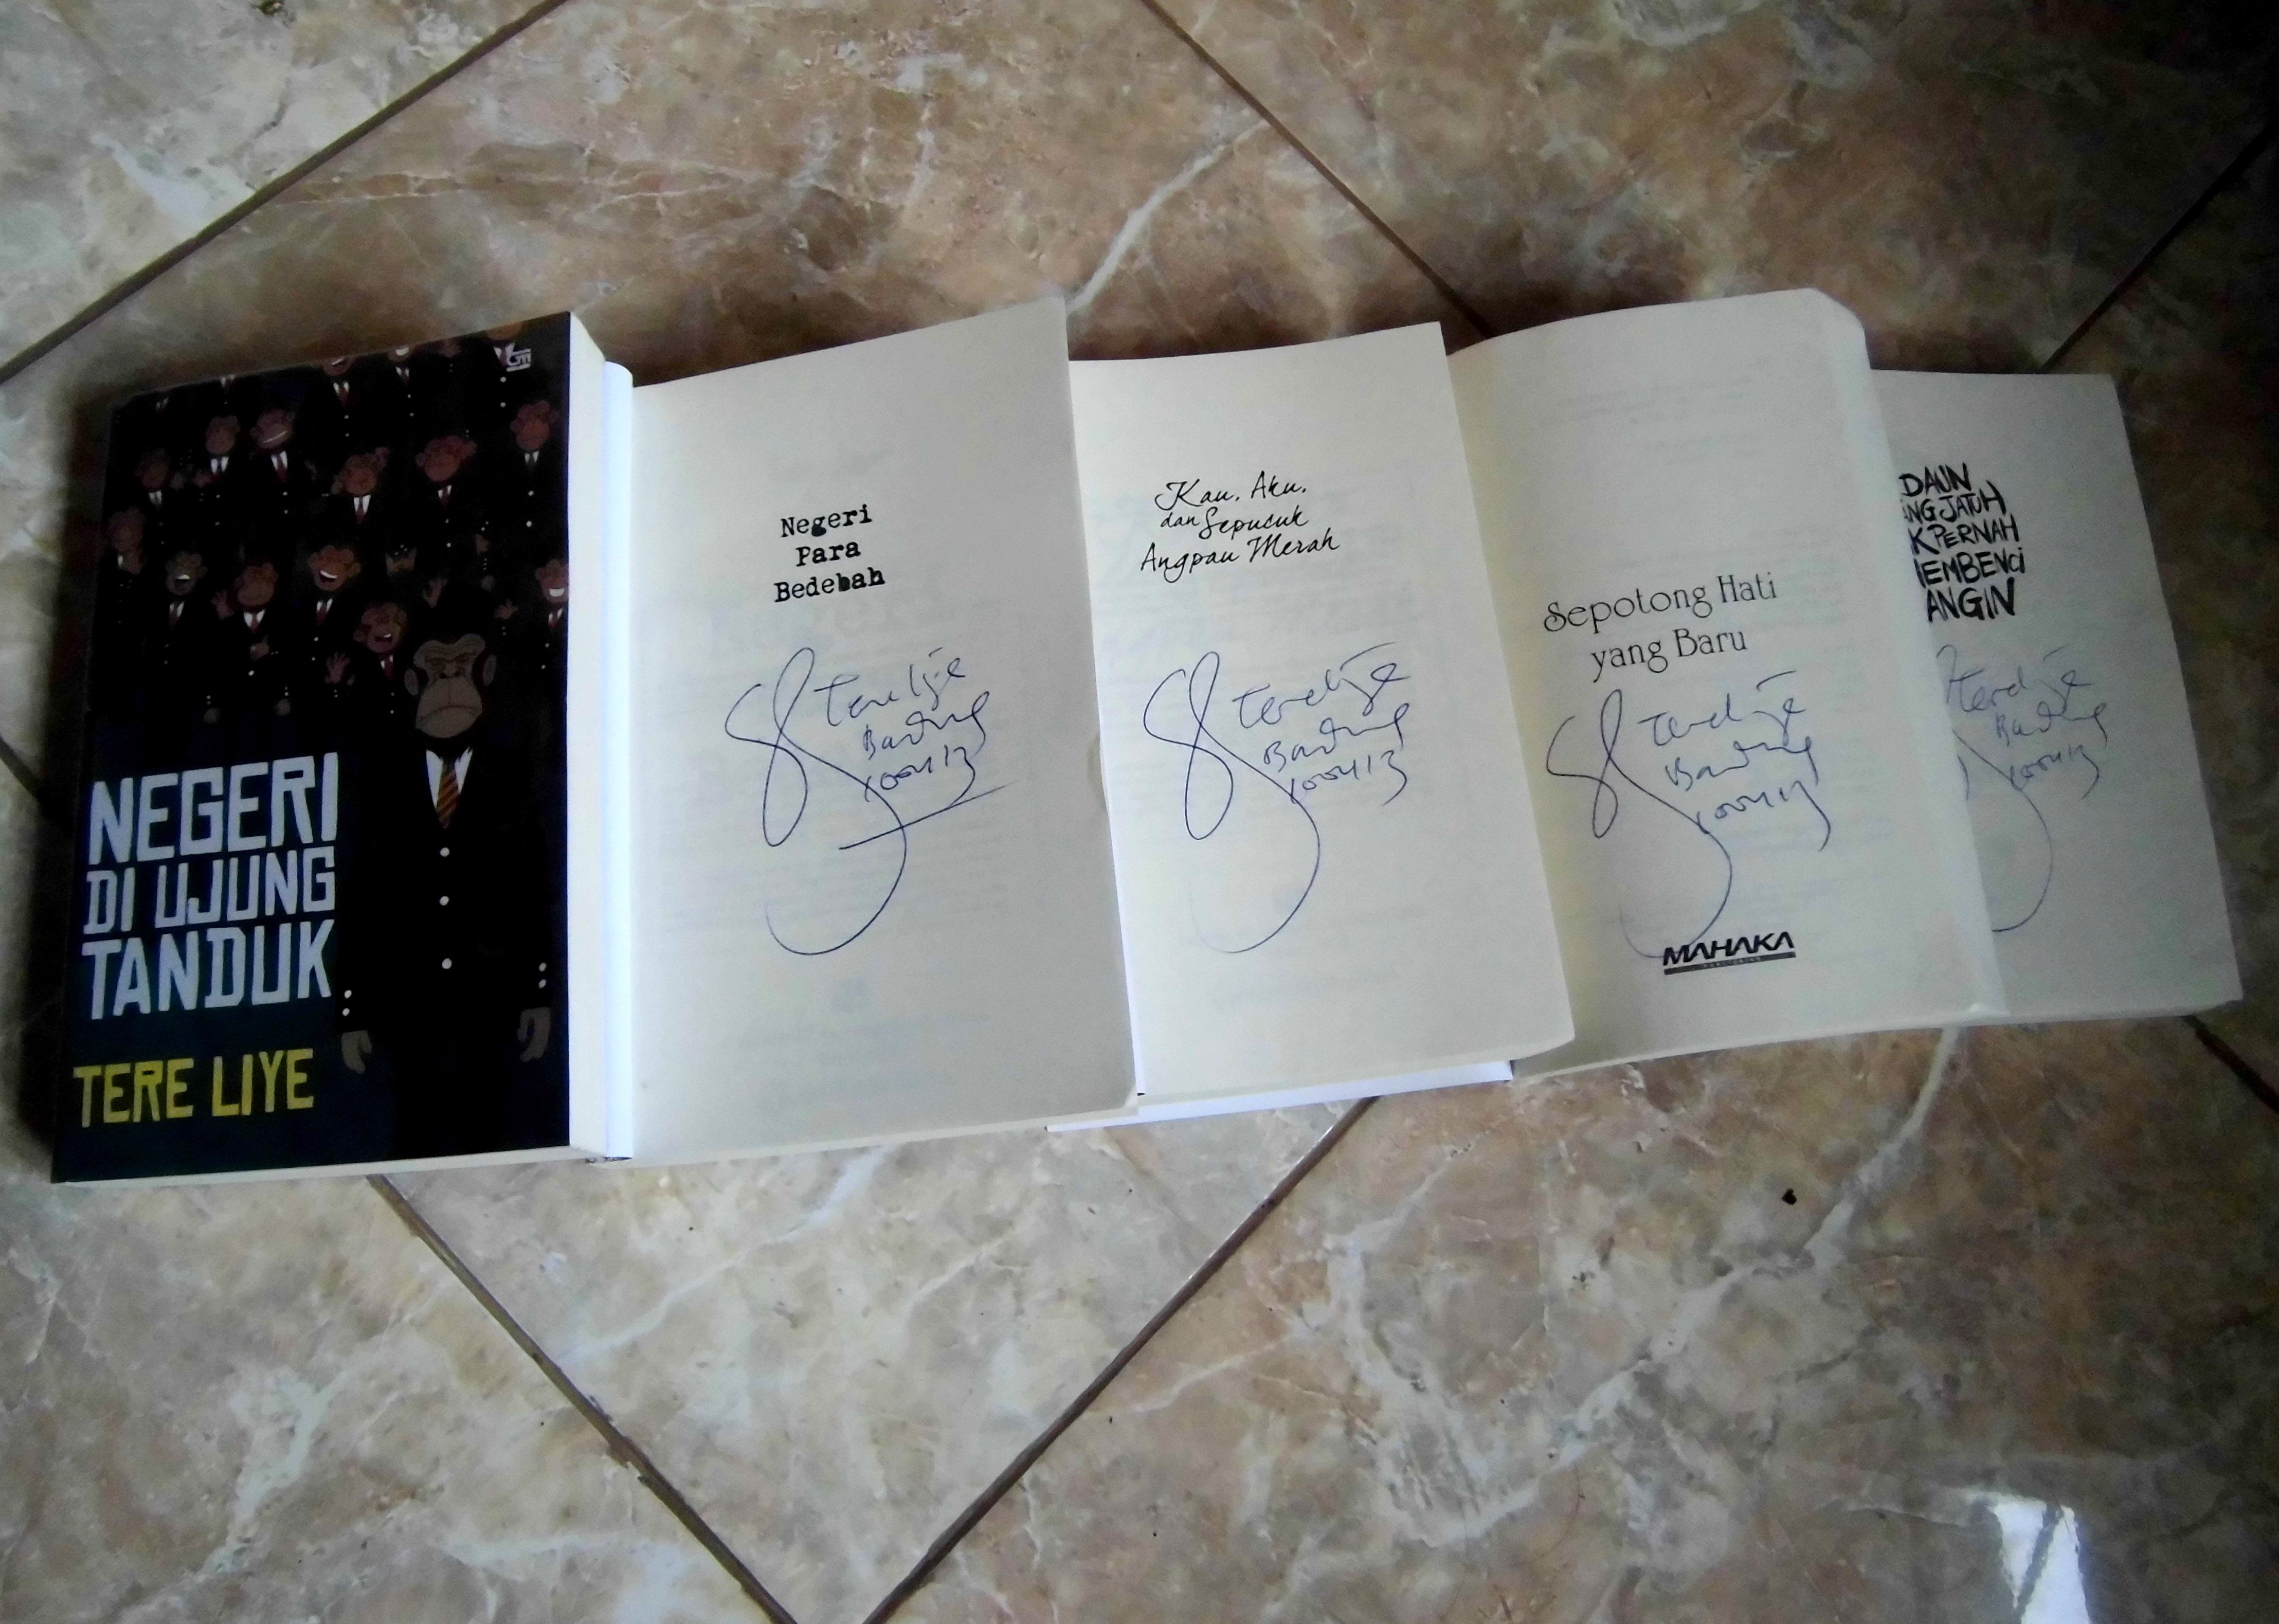 Novel Infiruu Khifafan Wa Tsiqolan Negeri Para Bedebah Tere Liye Cimg0439